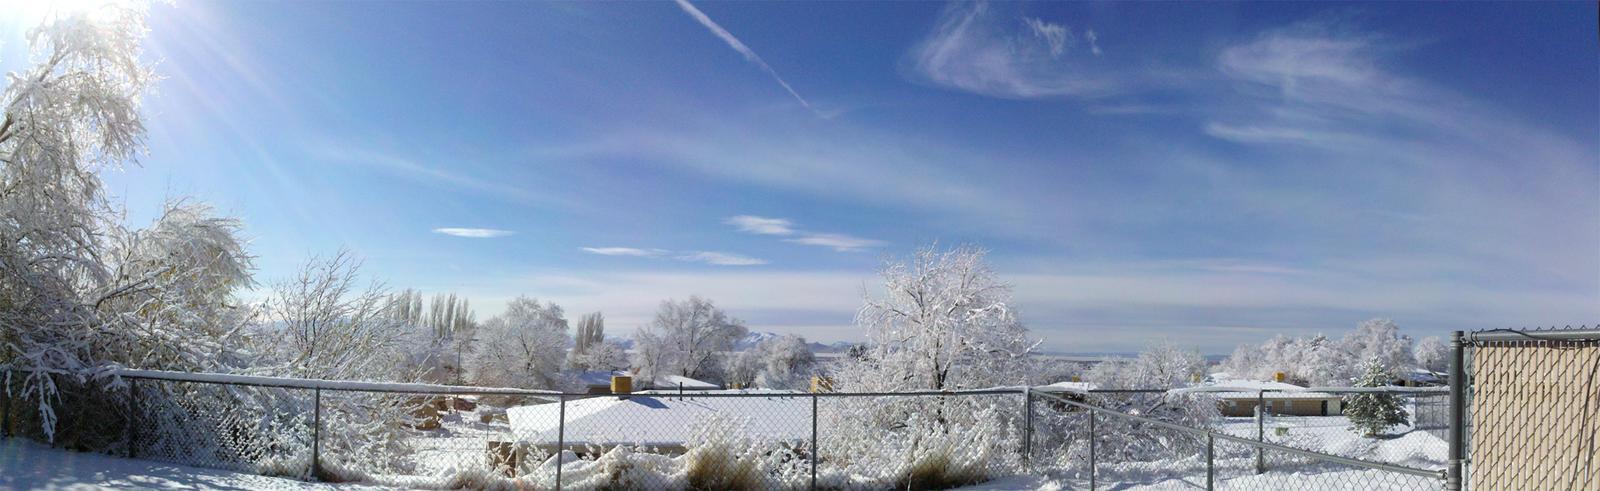 Winter by esjay1986